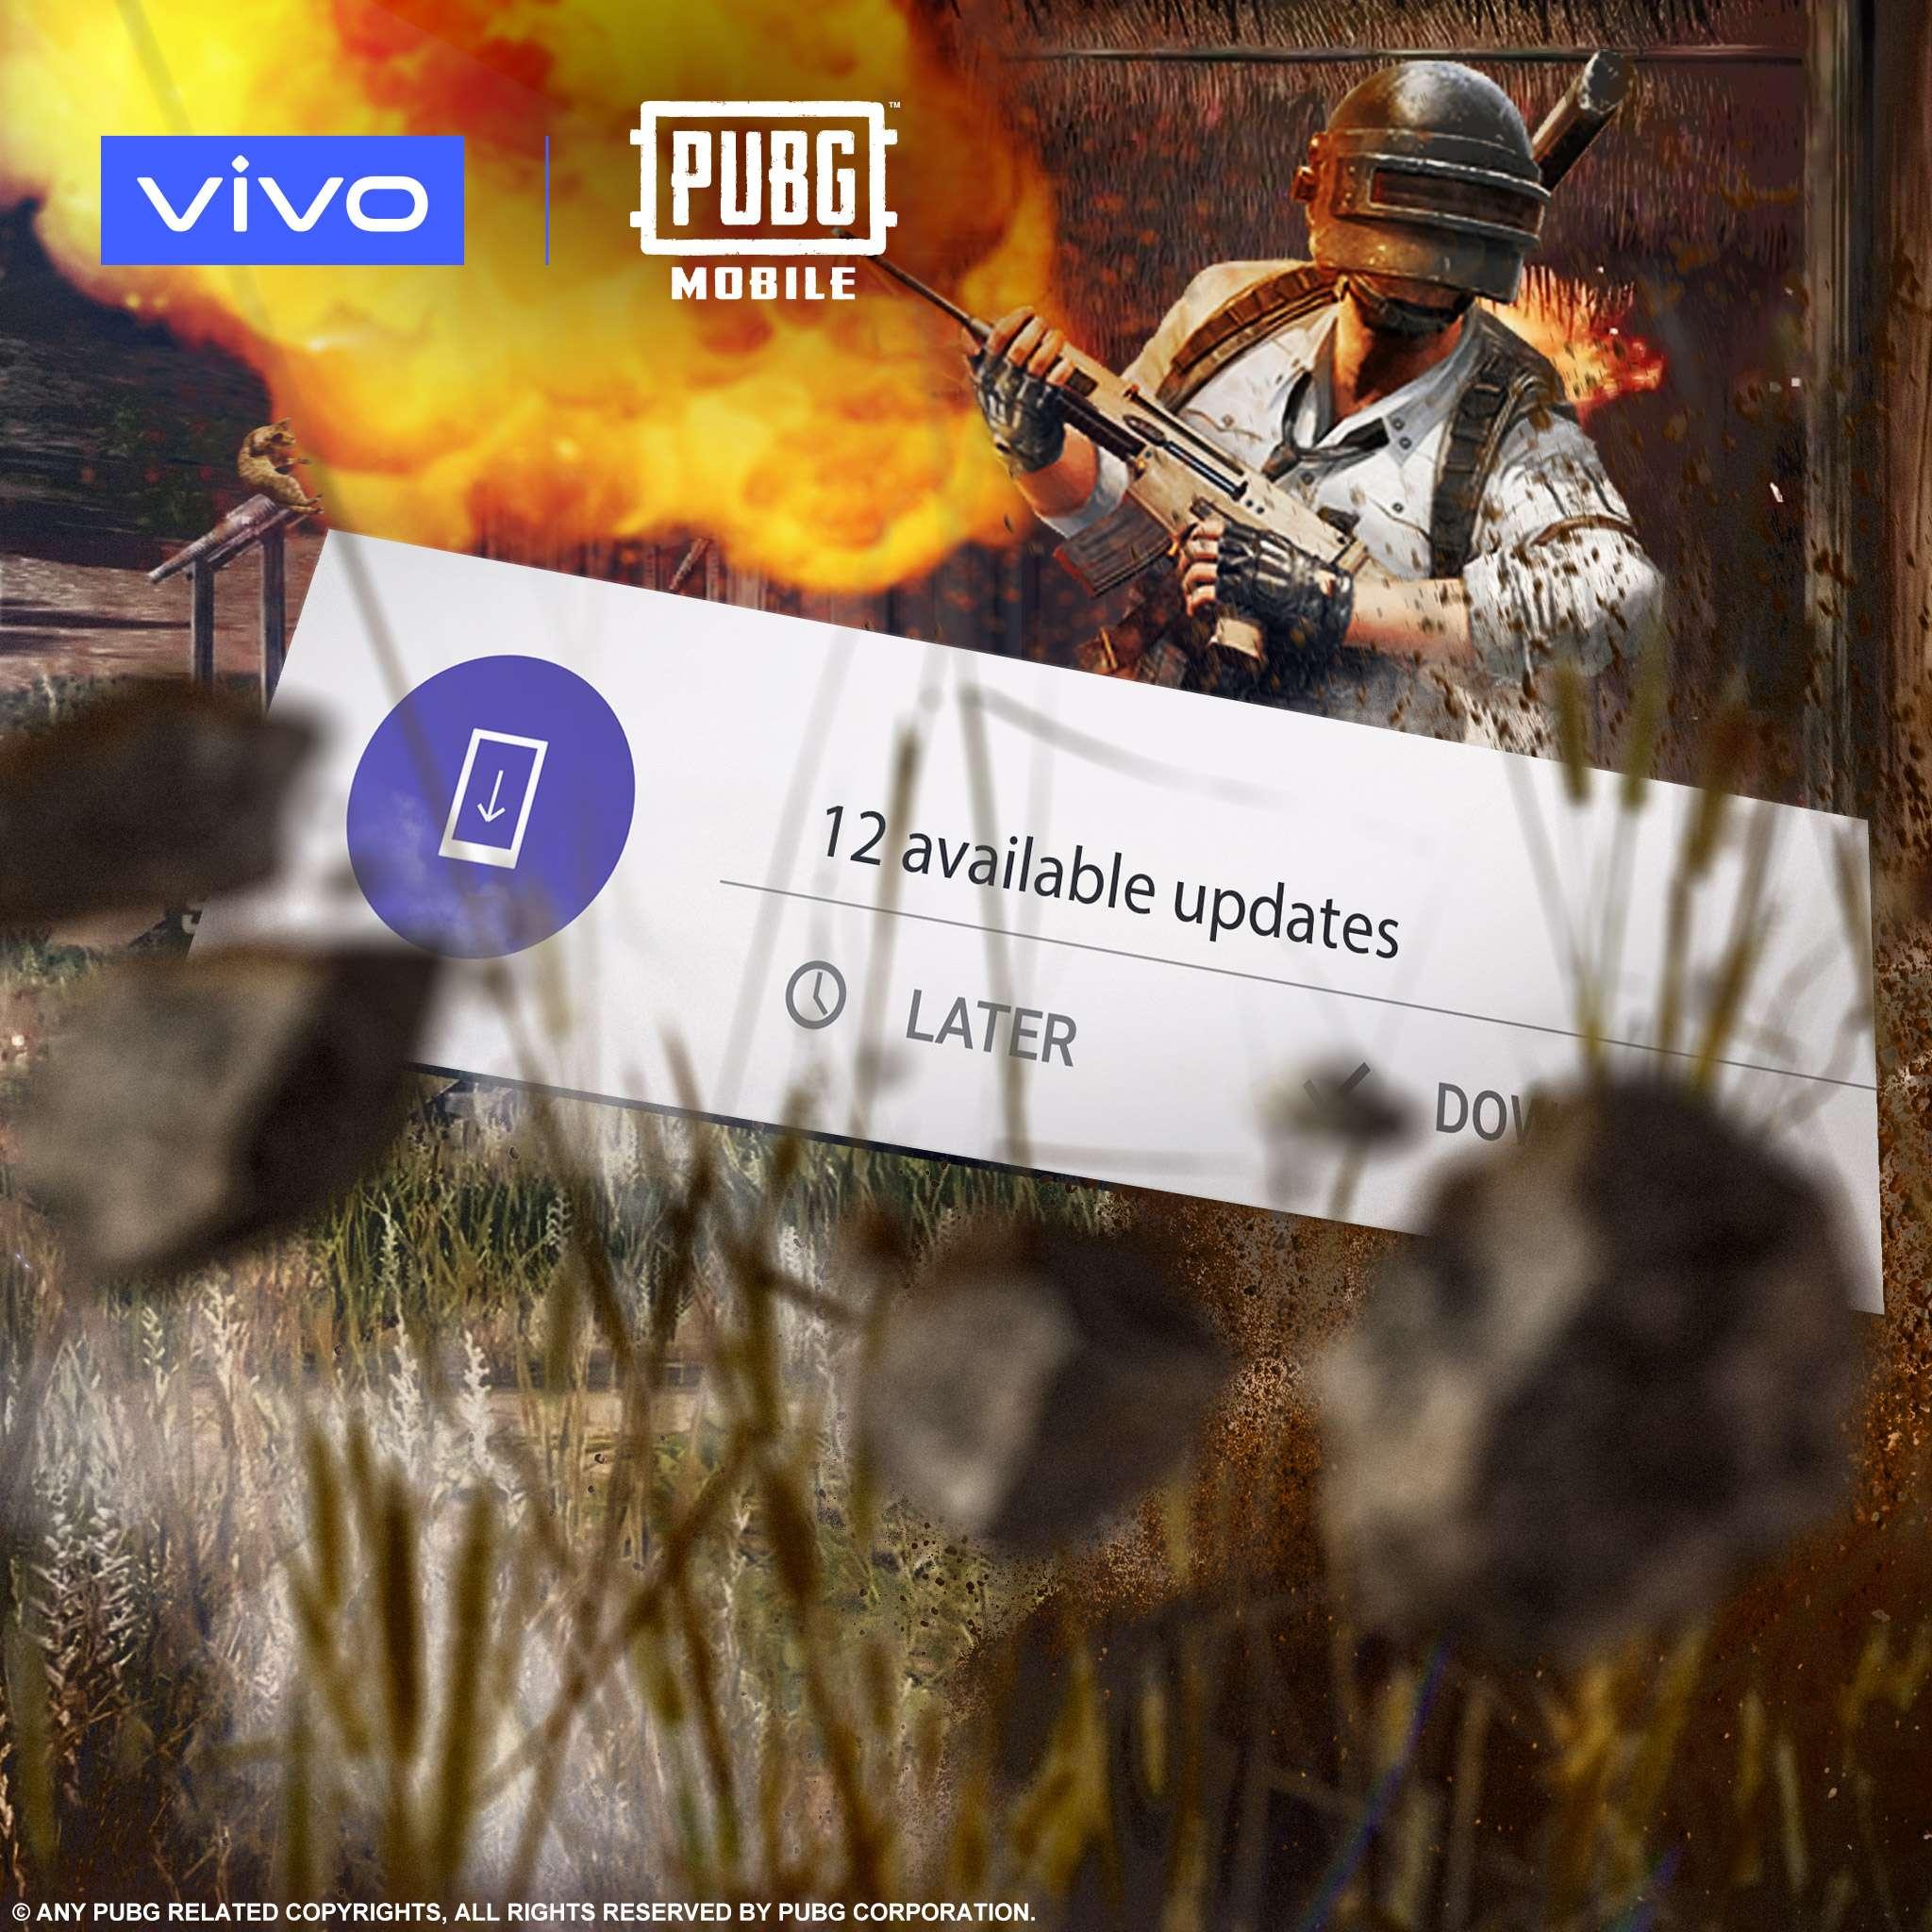 Vivo_socialPost_PUBG_Explosion_essencial